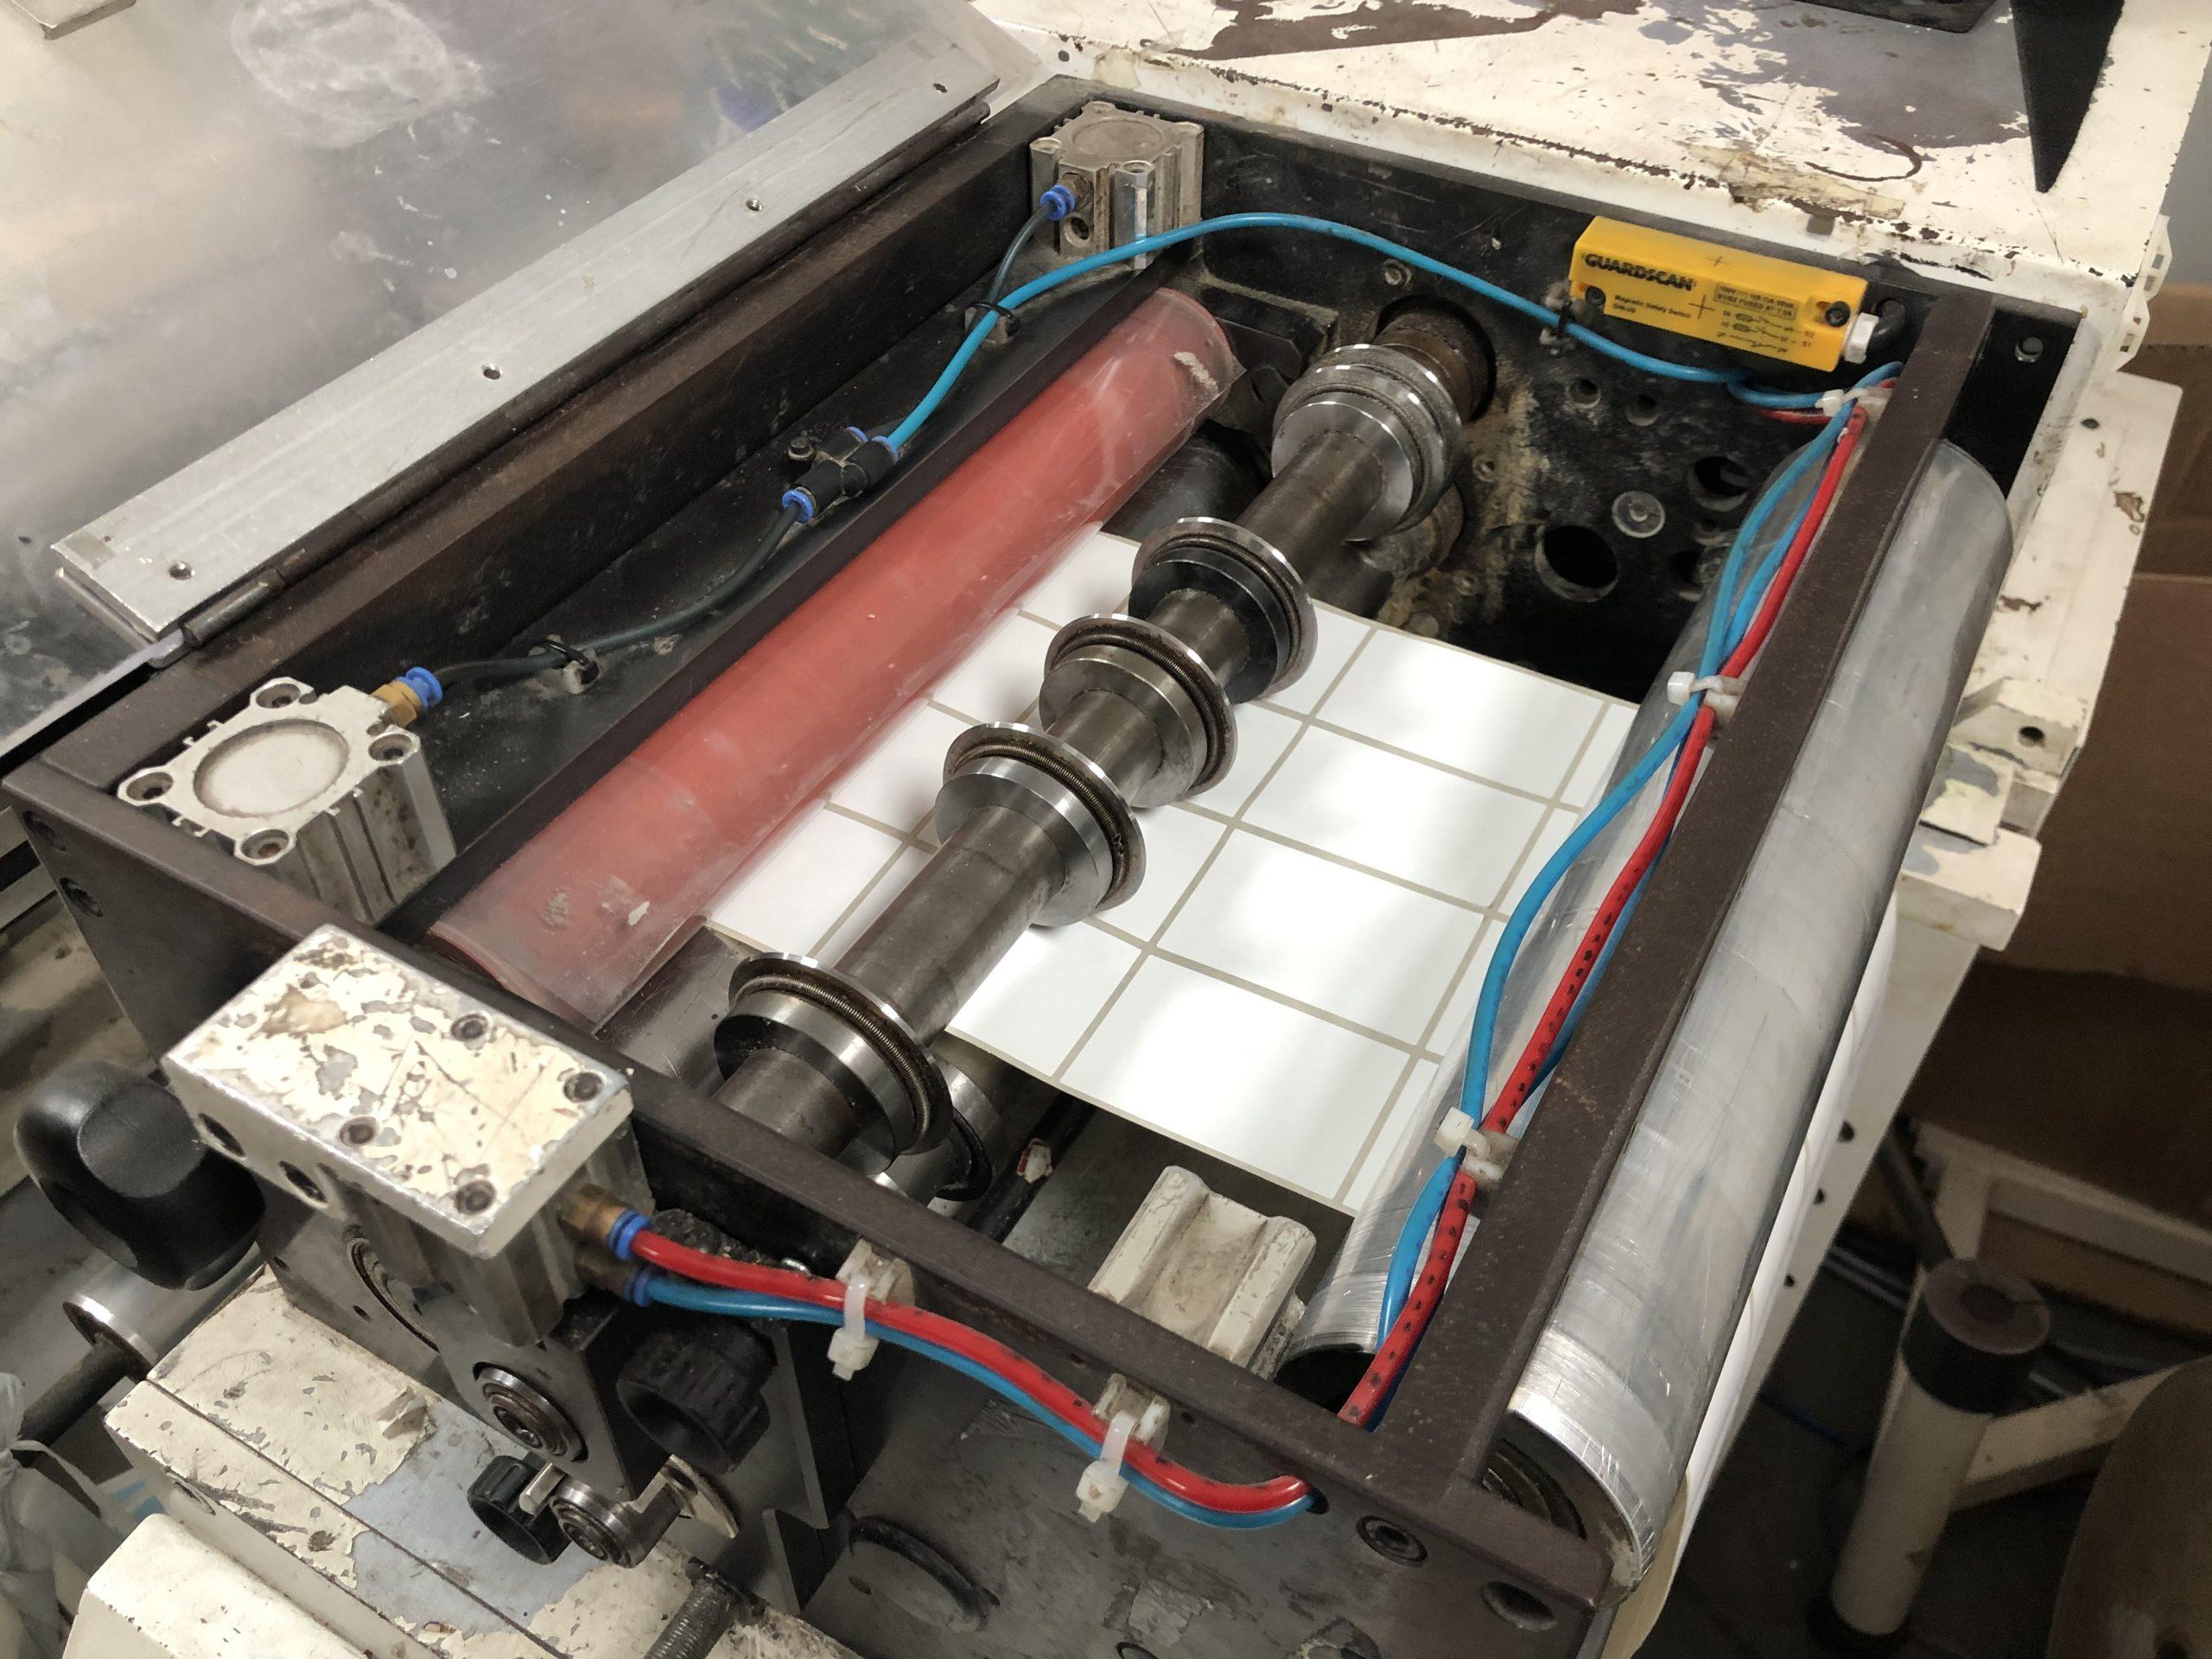 ABG Omega 330 + ABG Vectra SGTR 330 - Used Flexo Printing Presses and Used Flexographic Equipment-4